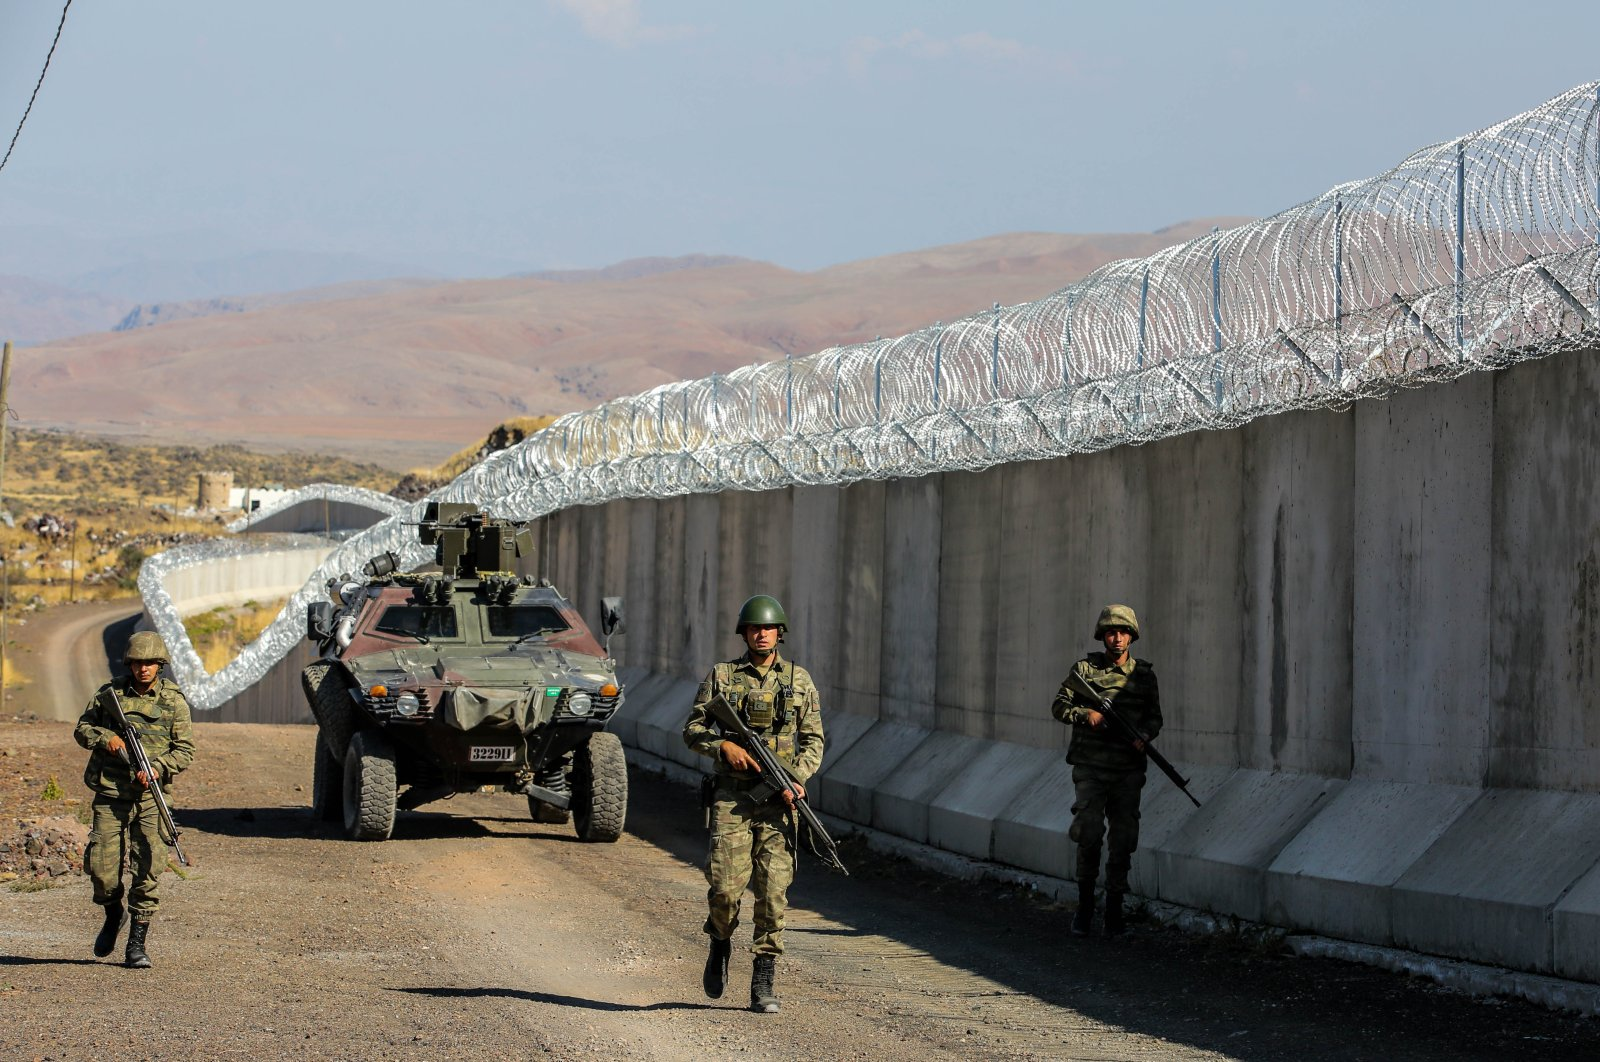 Turkish security forces patrol the eastern border with Iran, Van, Turkey, Aug. 19, 2021. (Photo by Uğur Yıldırım)